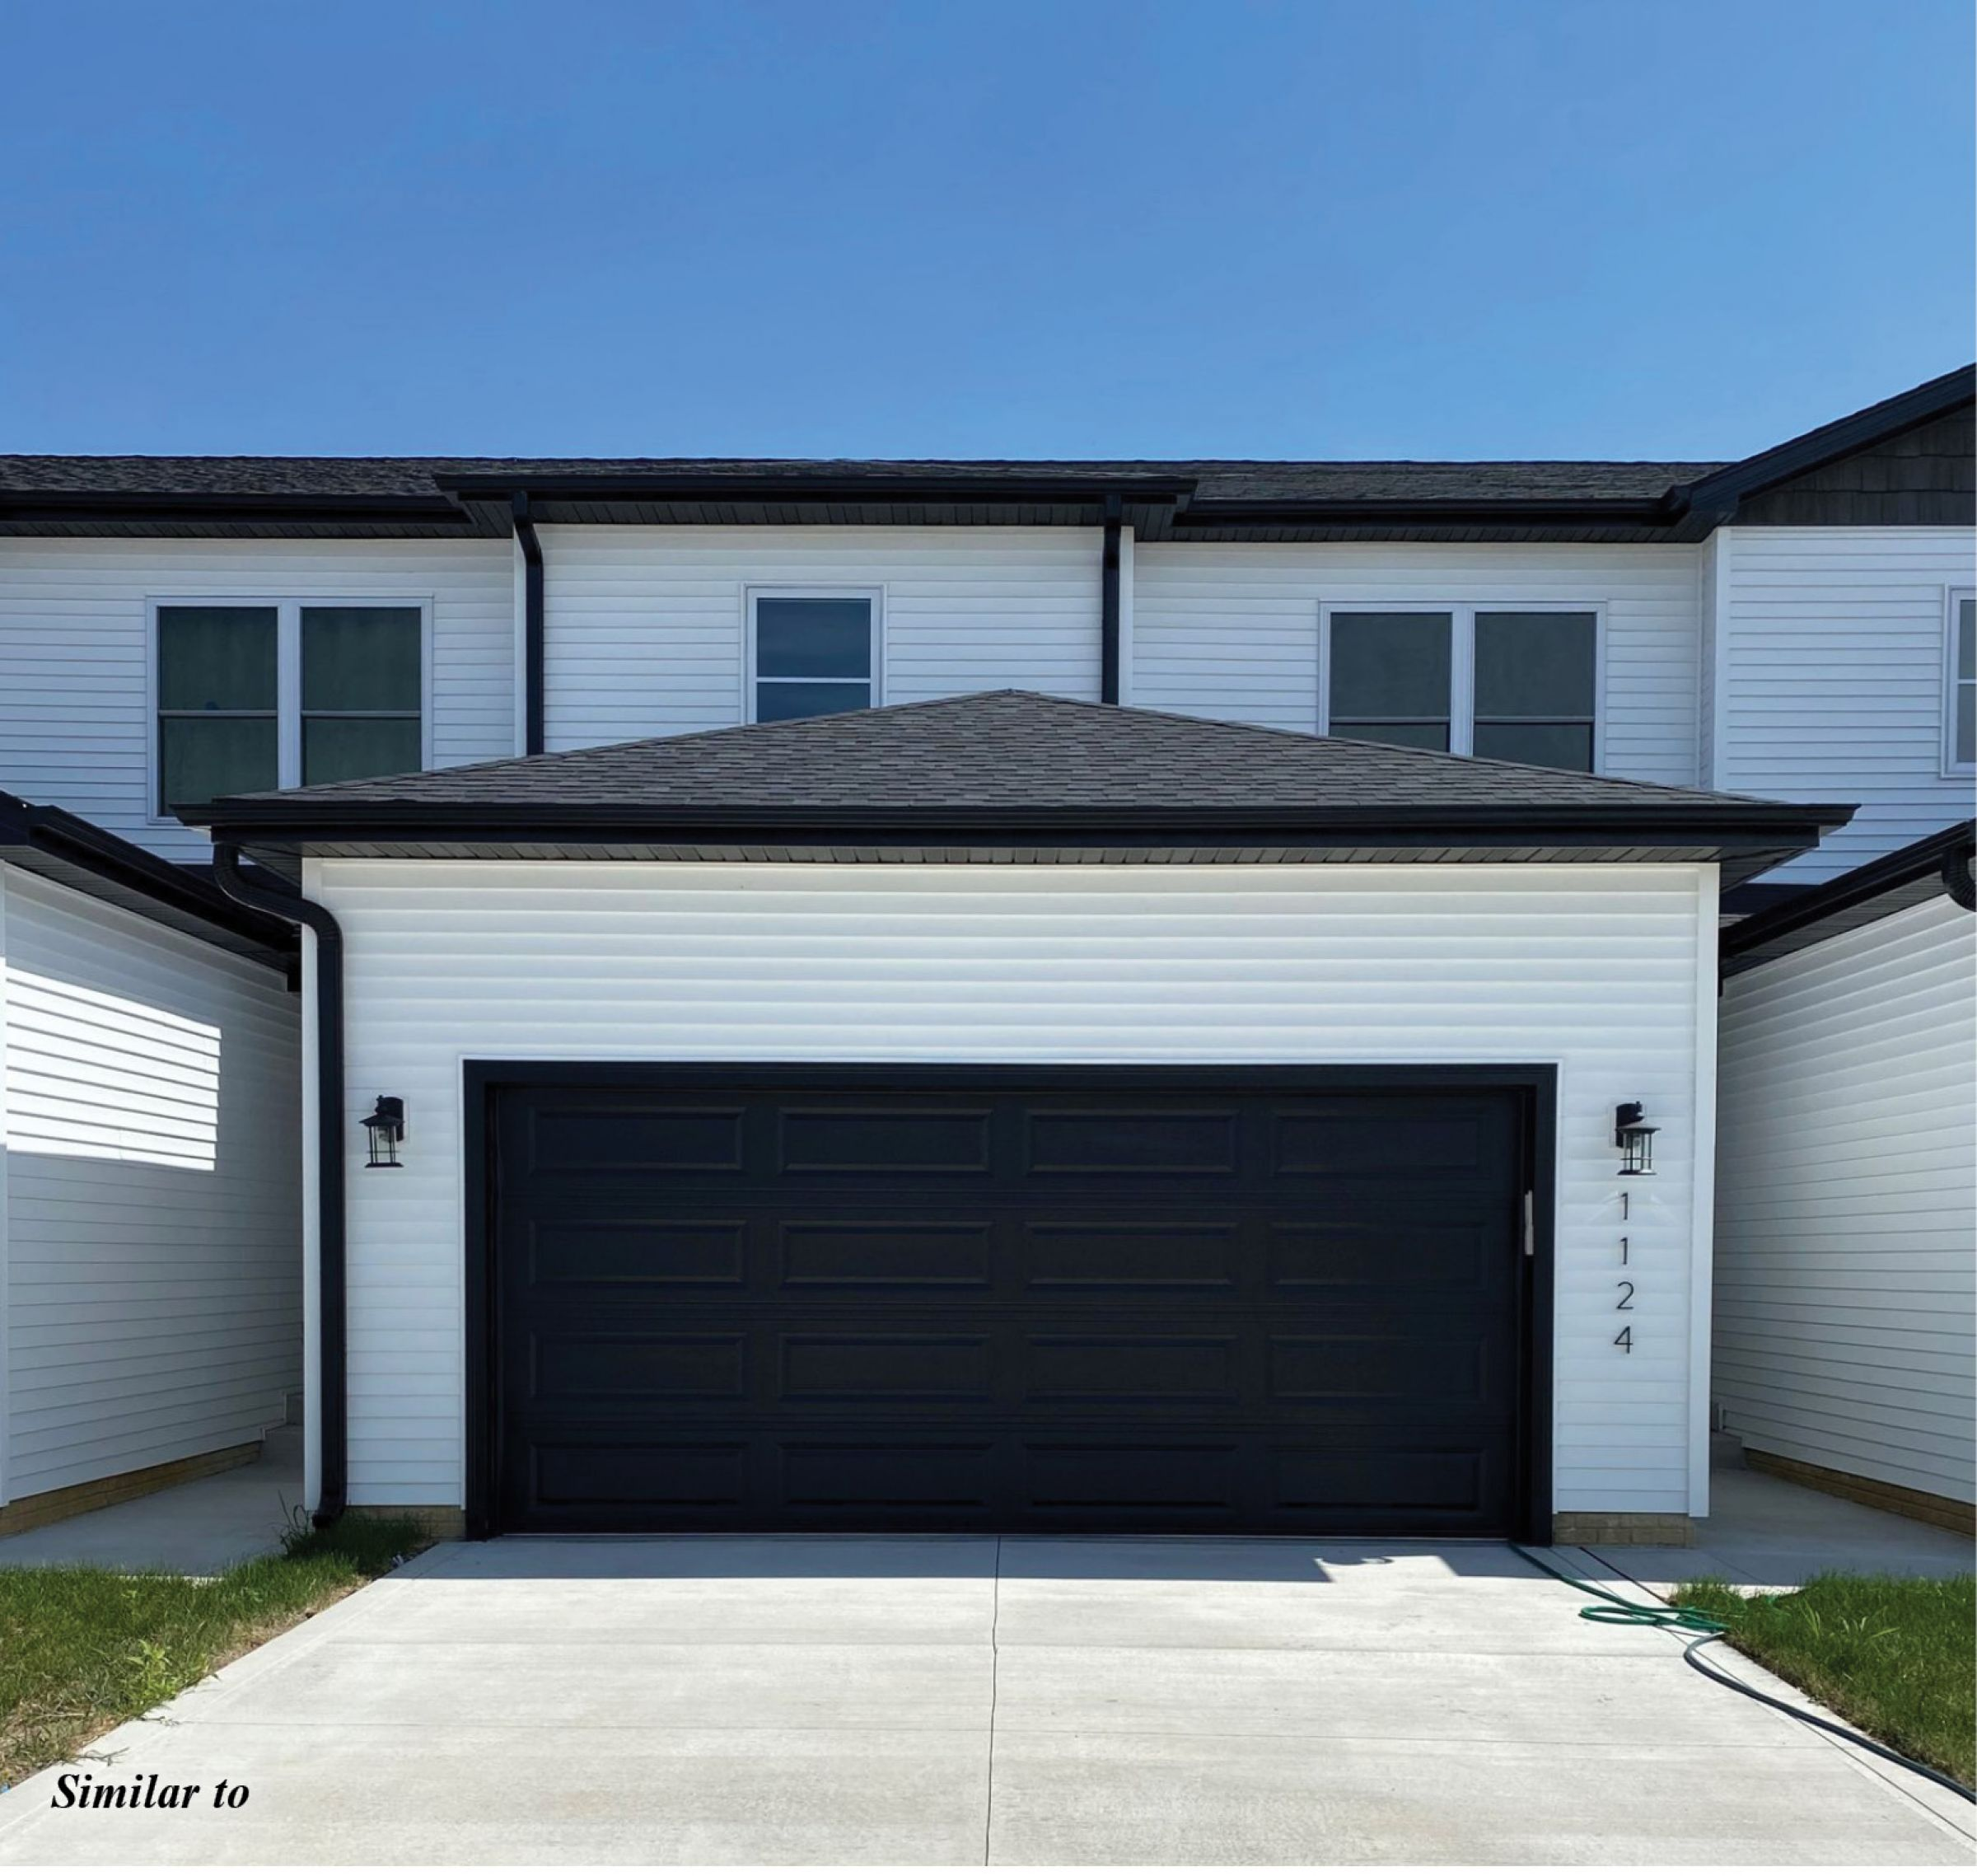 residential-warren-county-iowa-0-acres-listing-number-15366-19-2021-02-18-165345.jpg